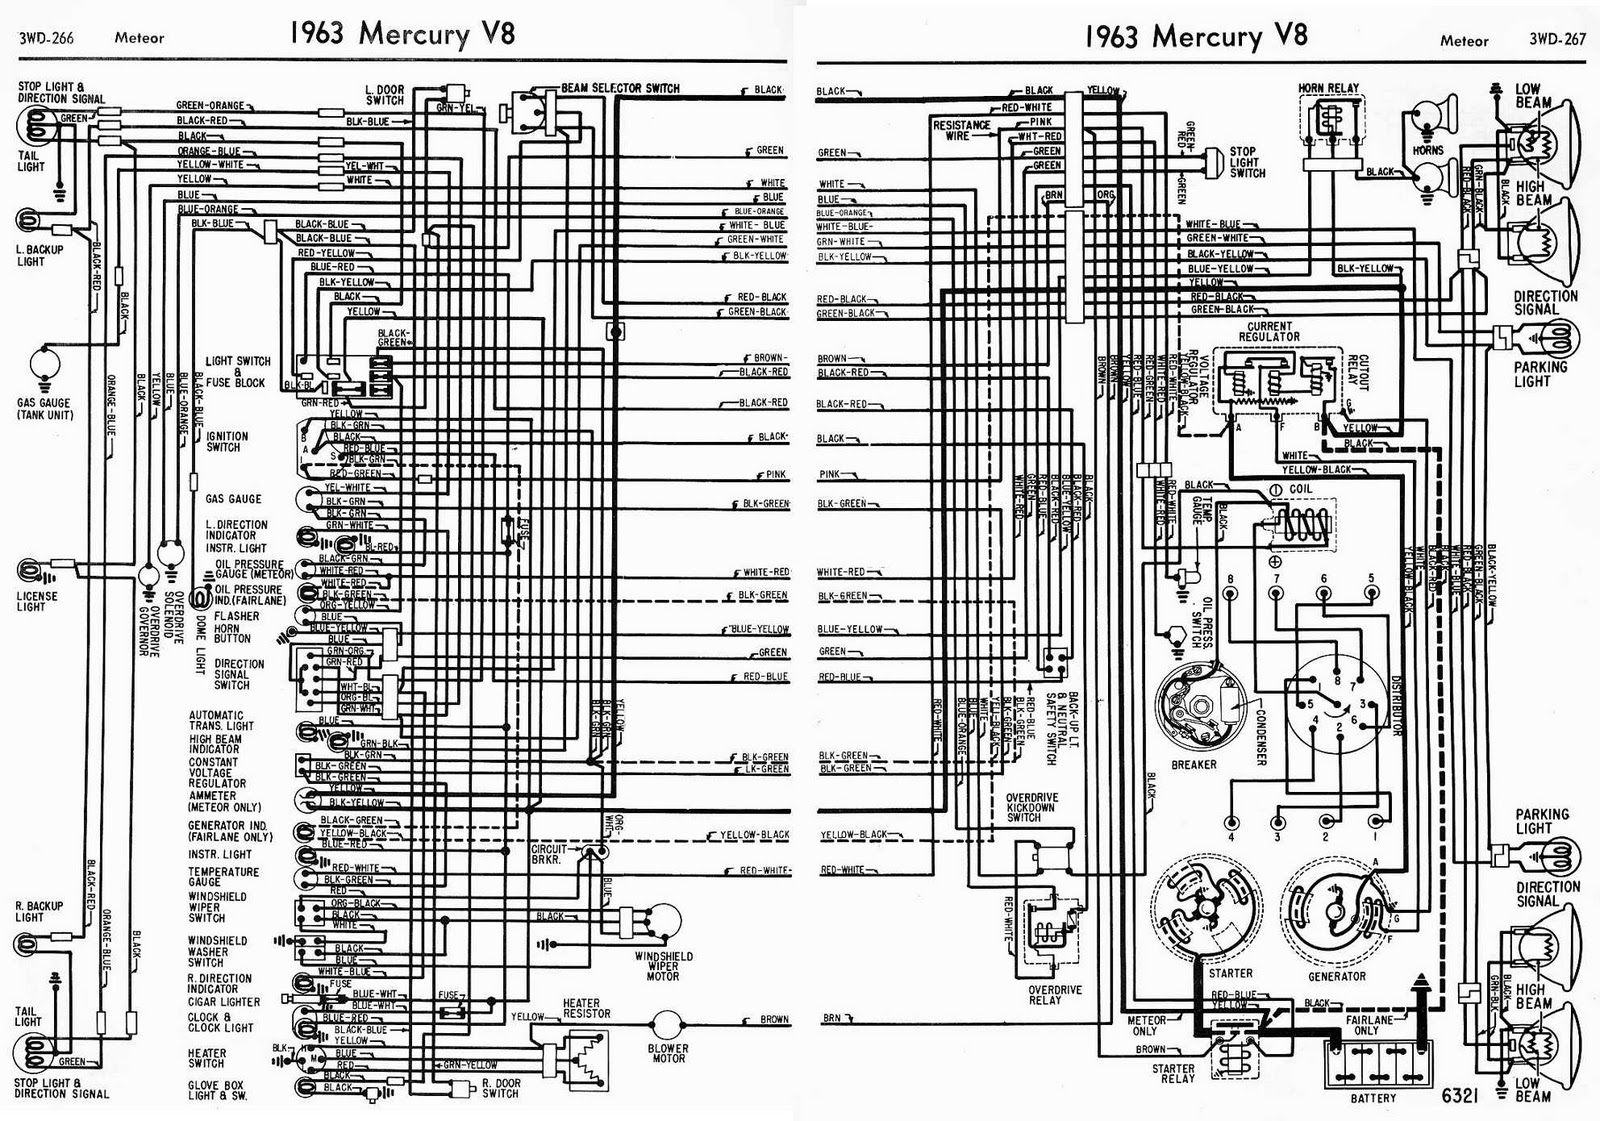 1972 Honda Trail 70 Wiring Diagram Schematic Diagrams Cl70 Schematics Fuel Tank